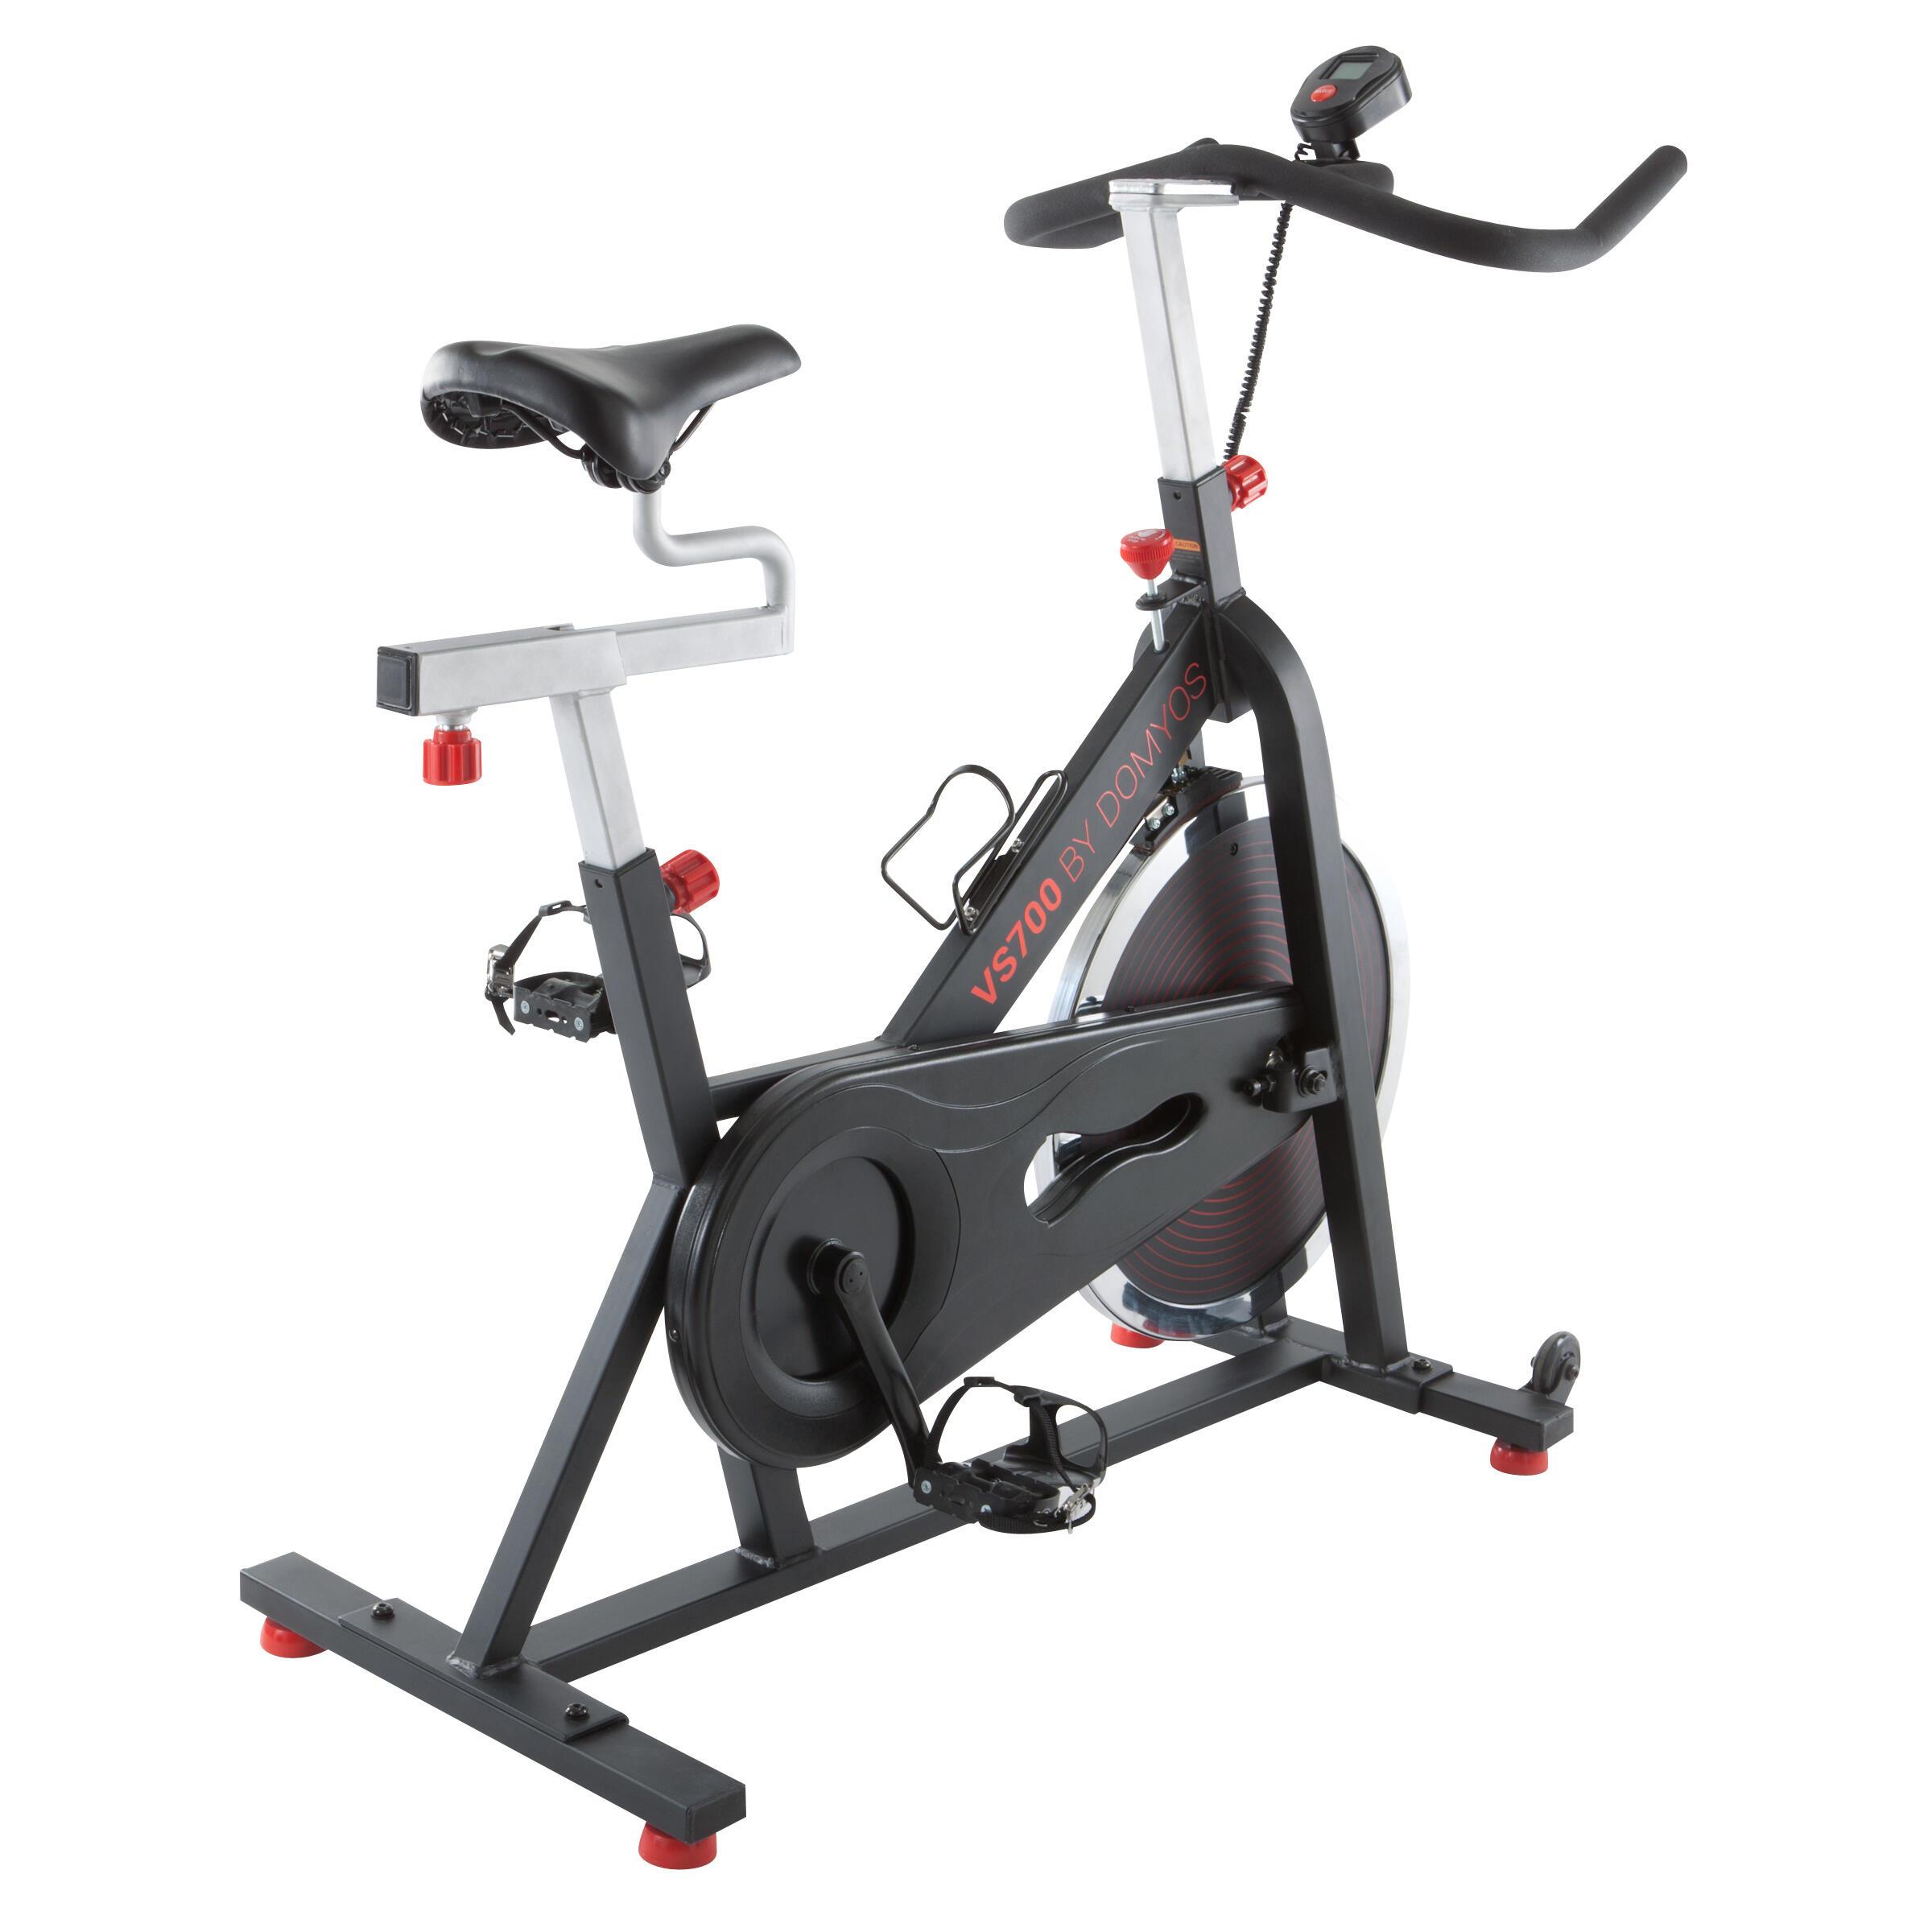 Bicicleta de spinning VS700